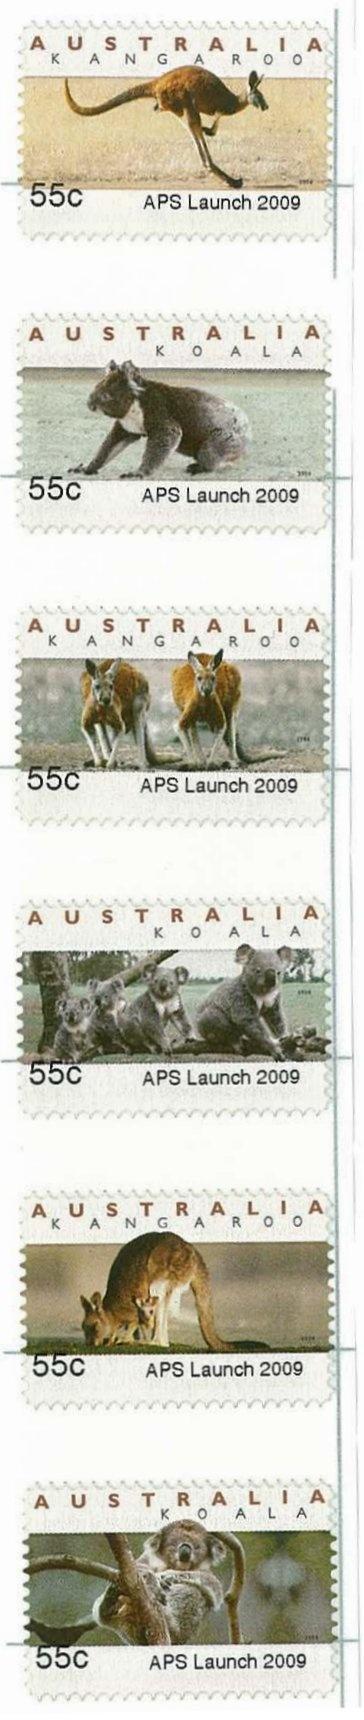 Australian stamps